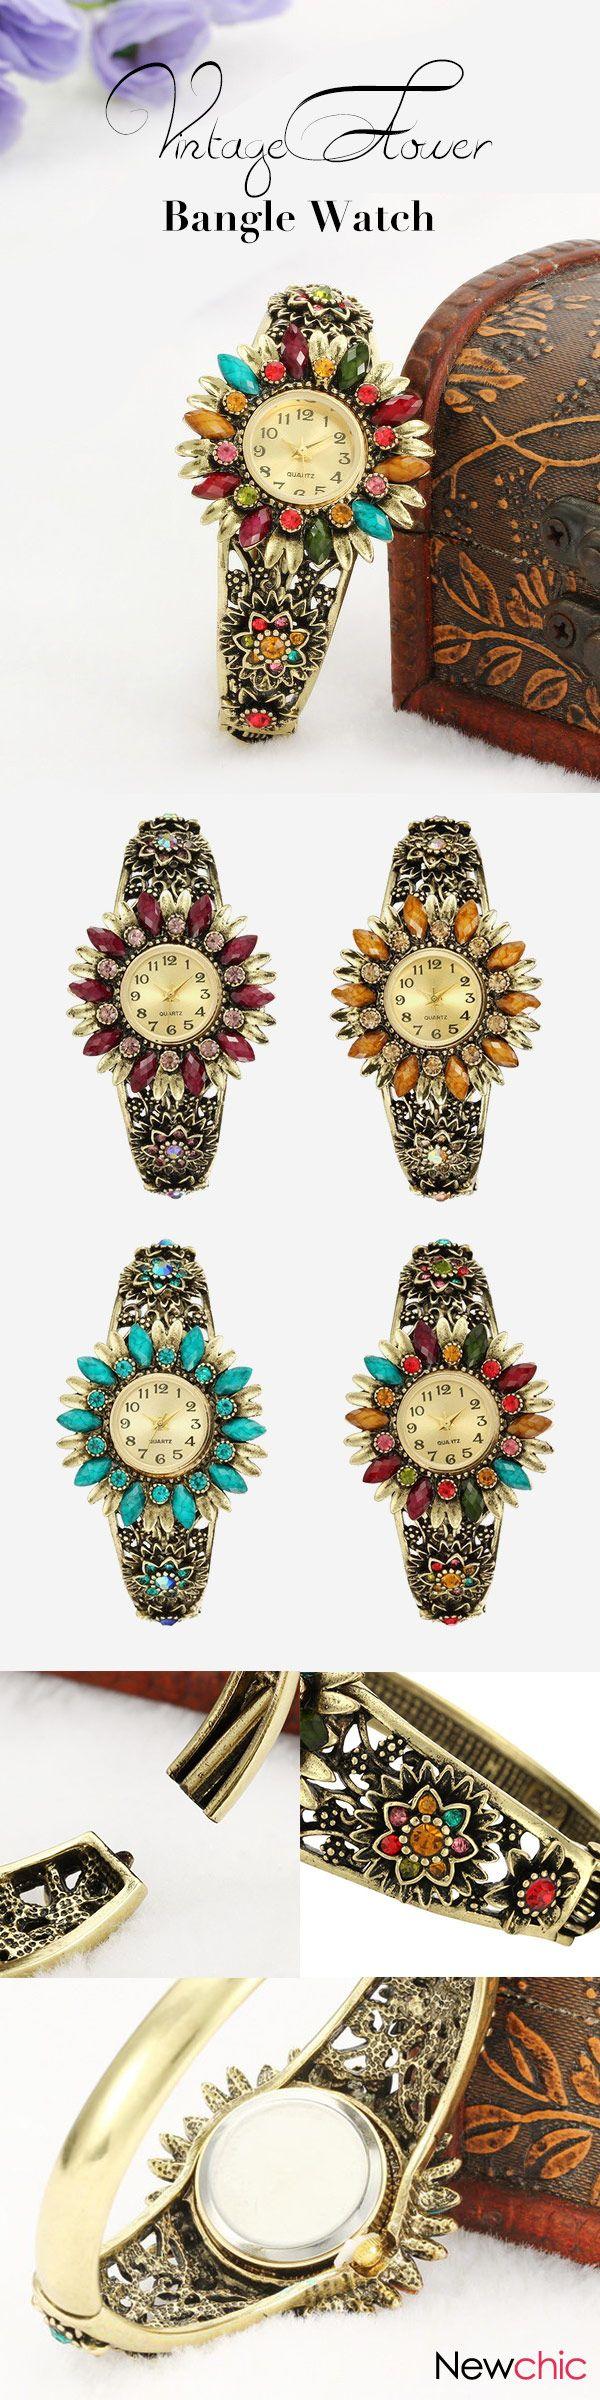 [Newchic Online Shopping] 45%OFF Women's Vintage Flower Bangle Watch